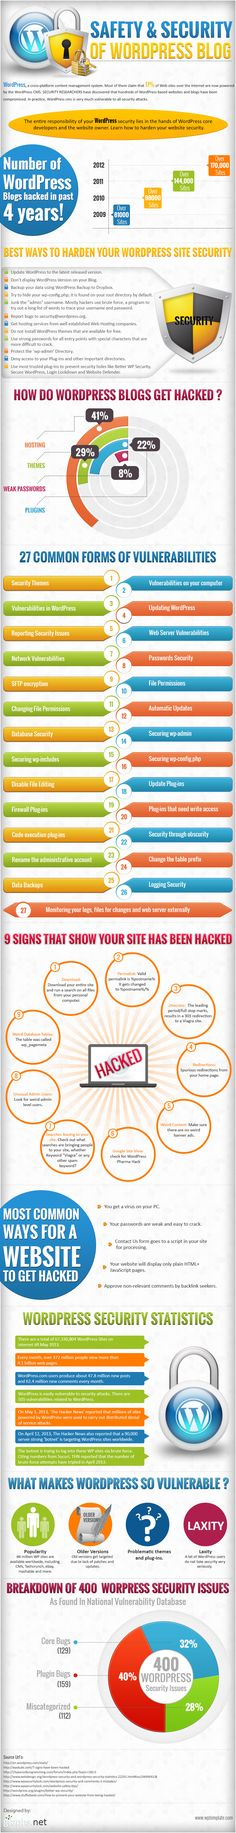 How To Tighten Your #WordPress Blog Security  http://www.digitalinformationworld.com/2013/07/harden-your-wordpress-site-security.html